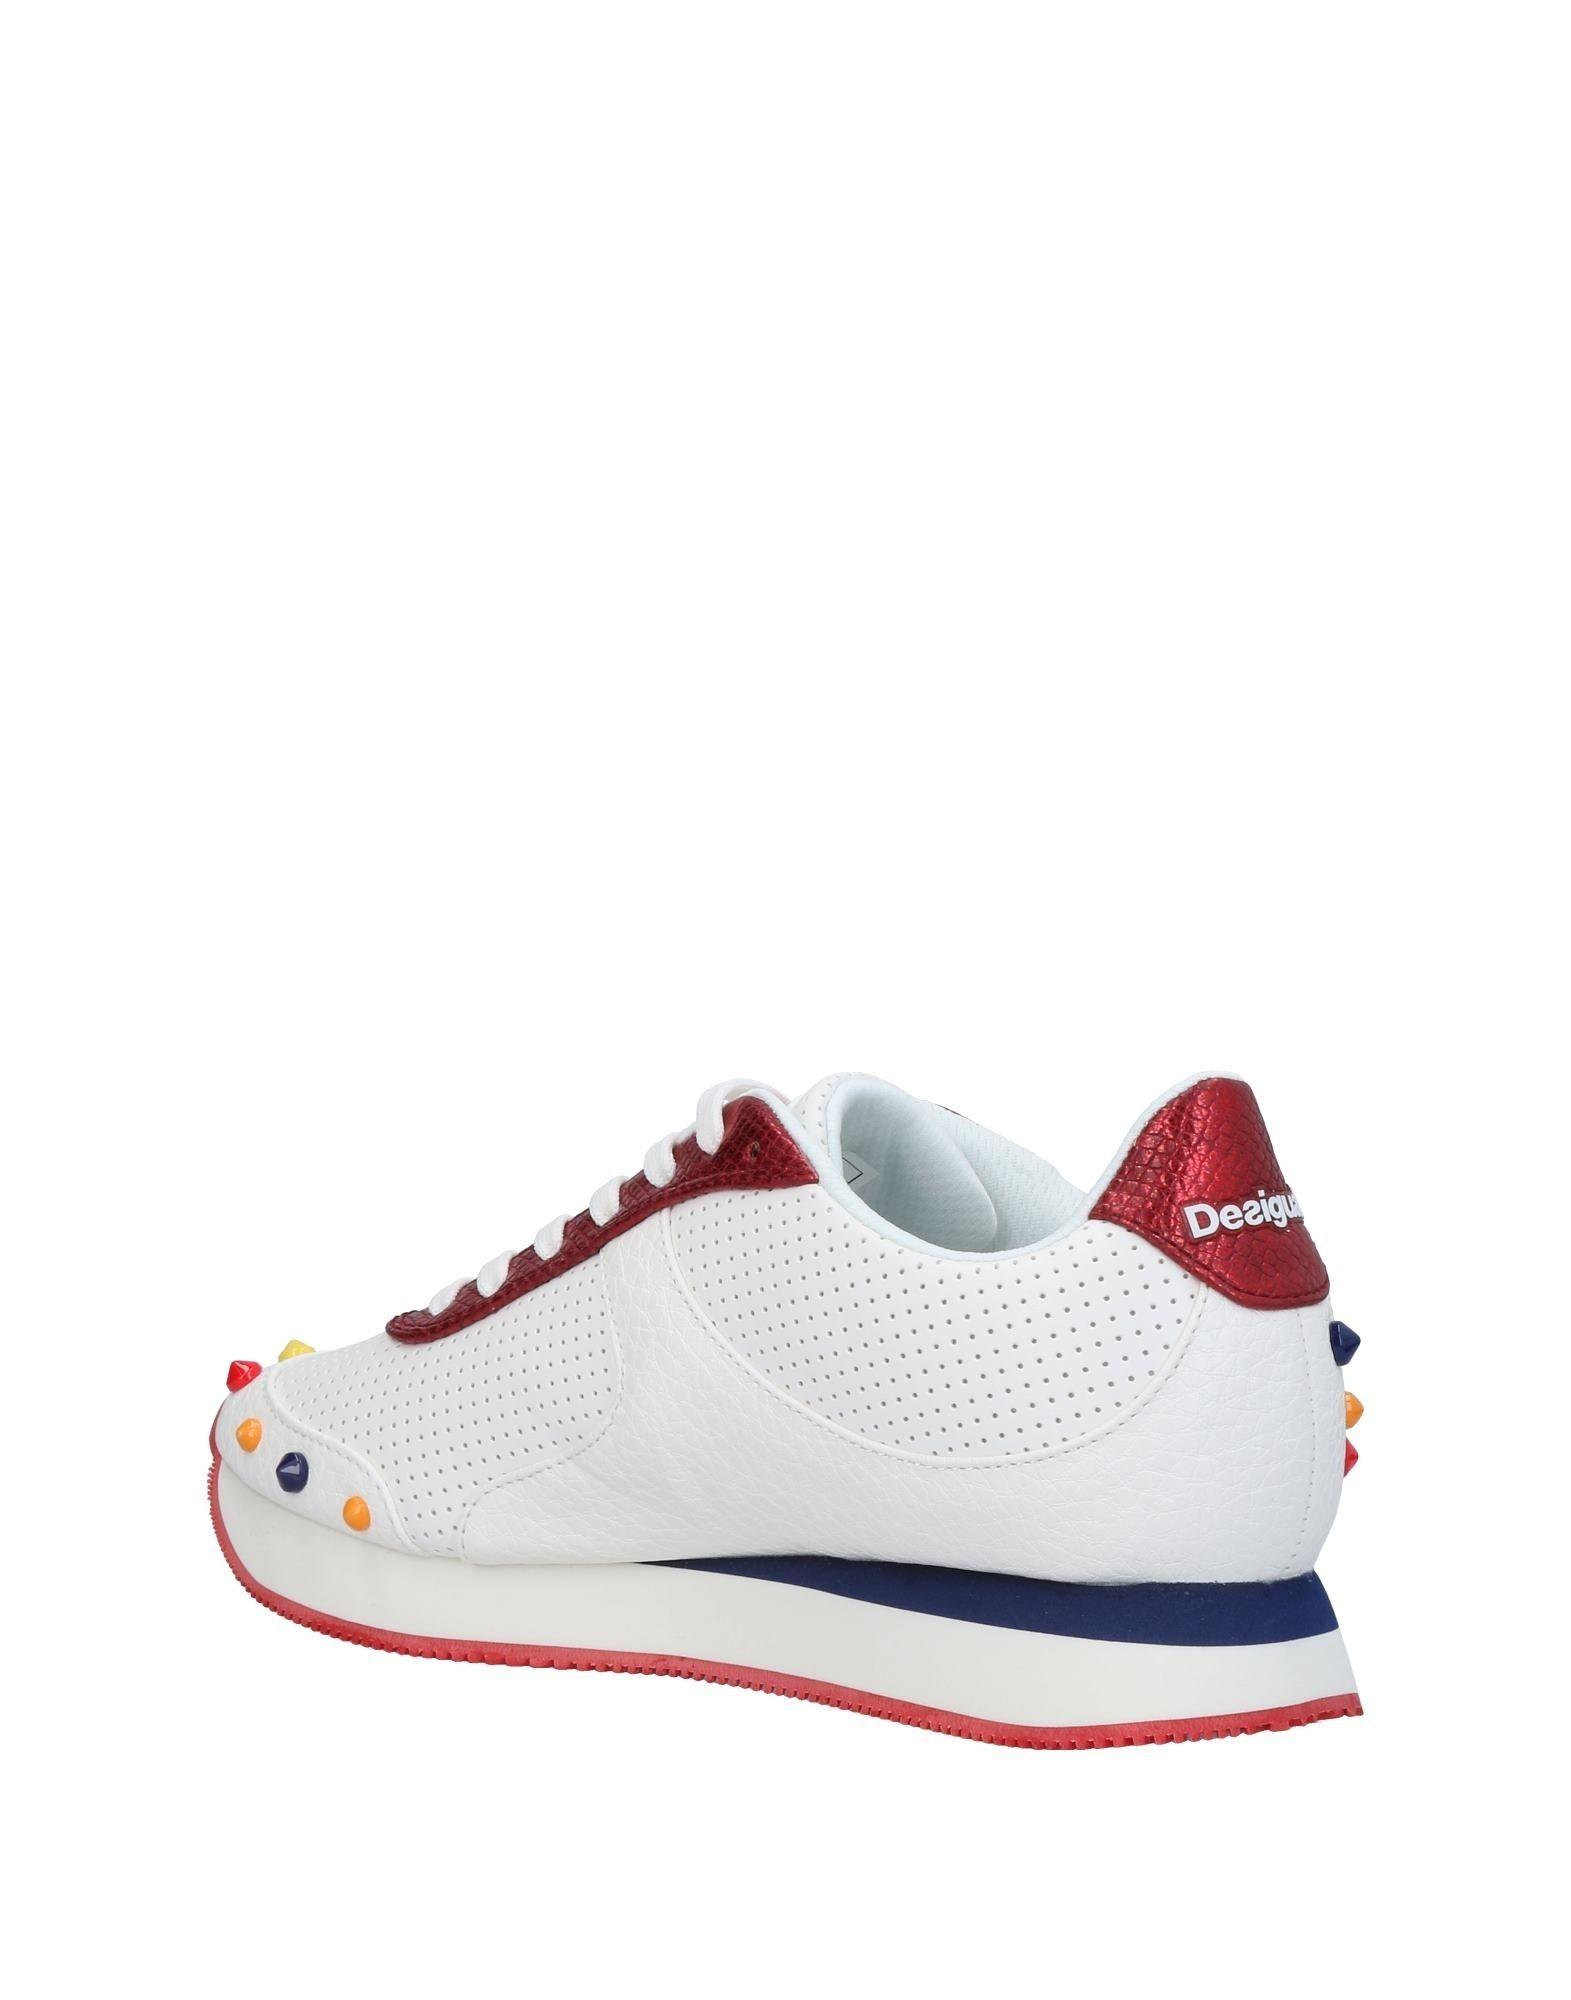 Desigual Sneakers Damen  11440089OQ Gute Qualität beliebte Schuhe